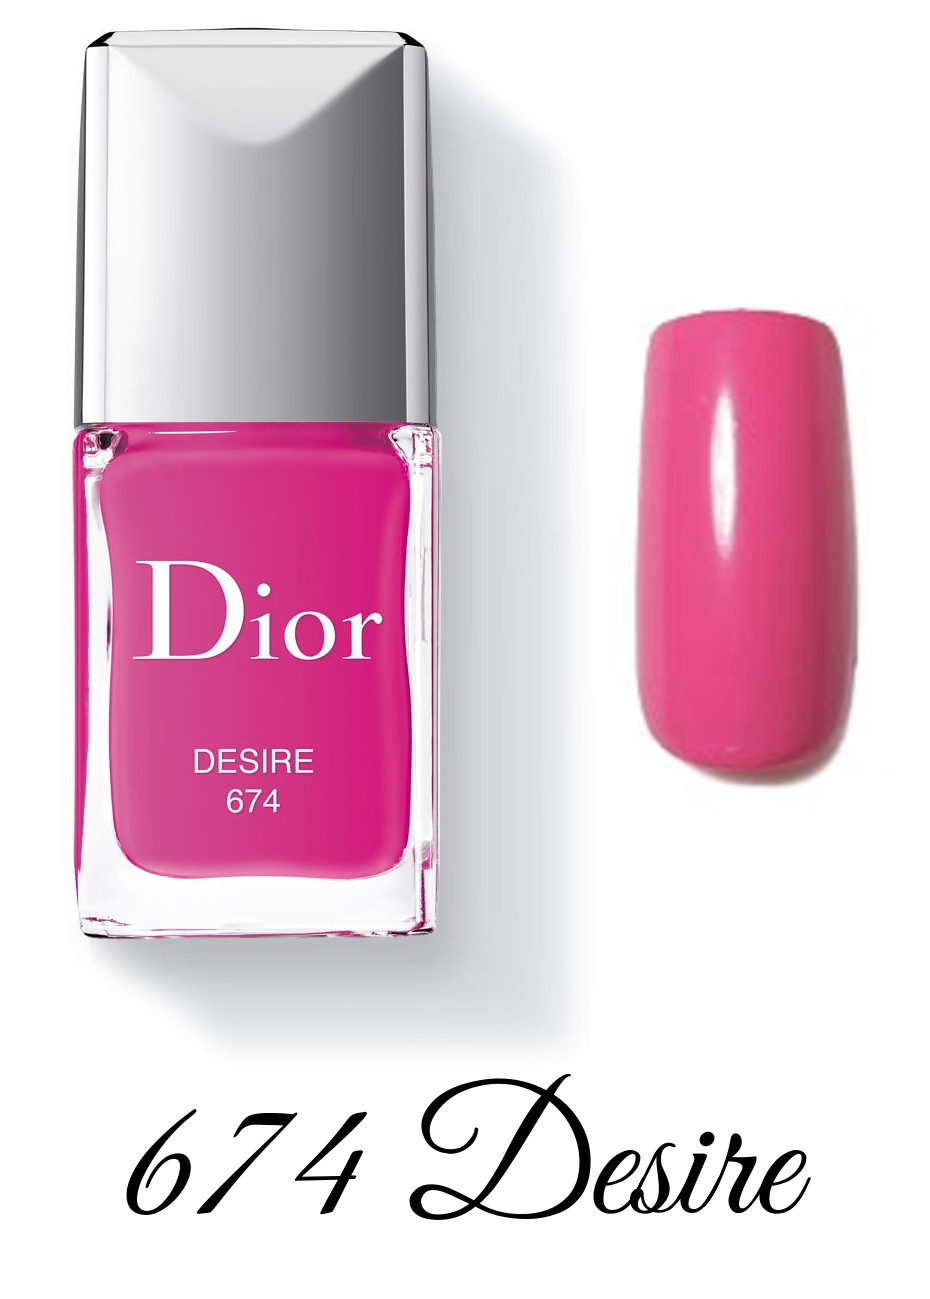 Dior Spring 2018 Collection GLOW ADDICT Dior Vernis 674 Desire